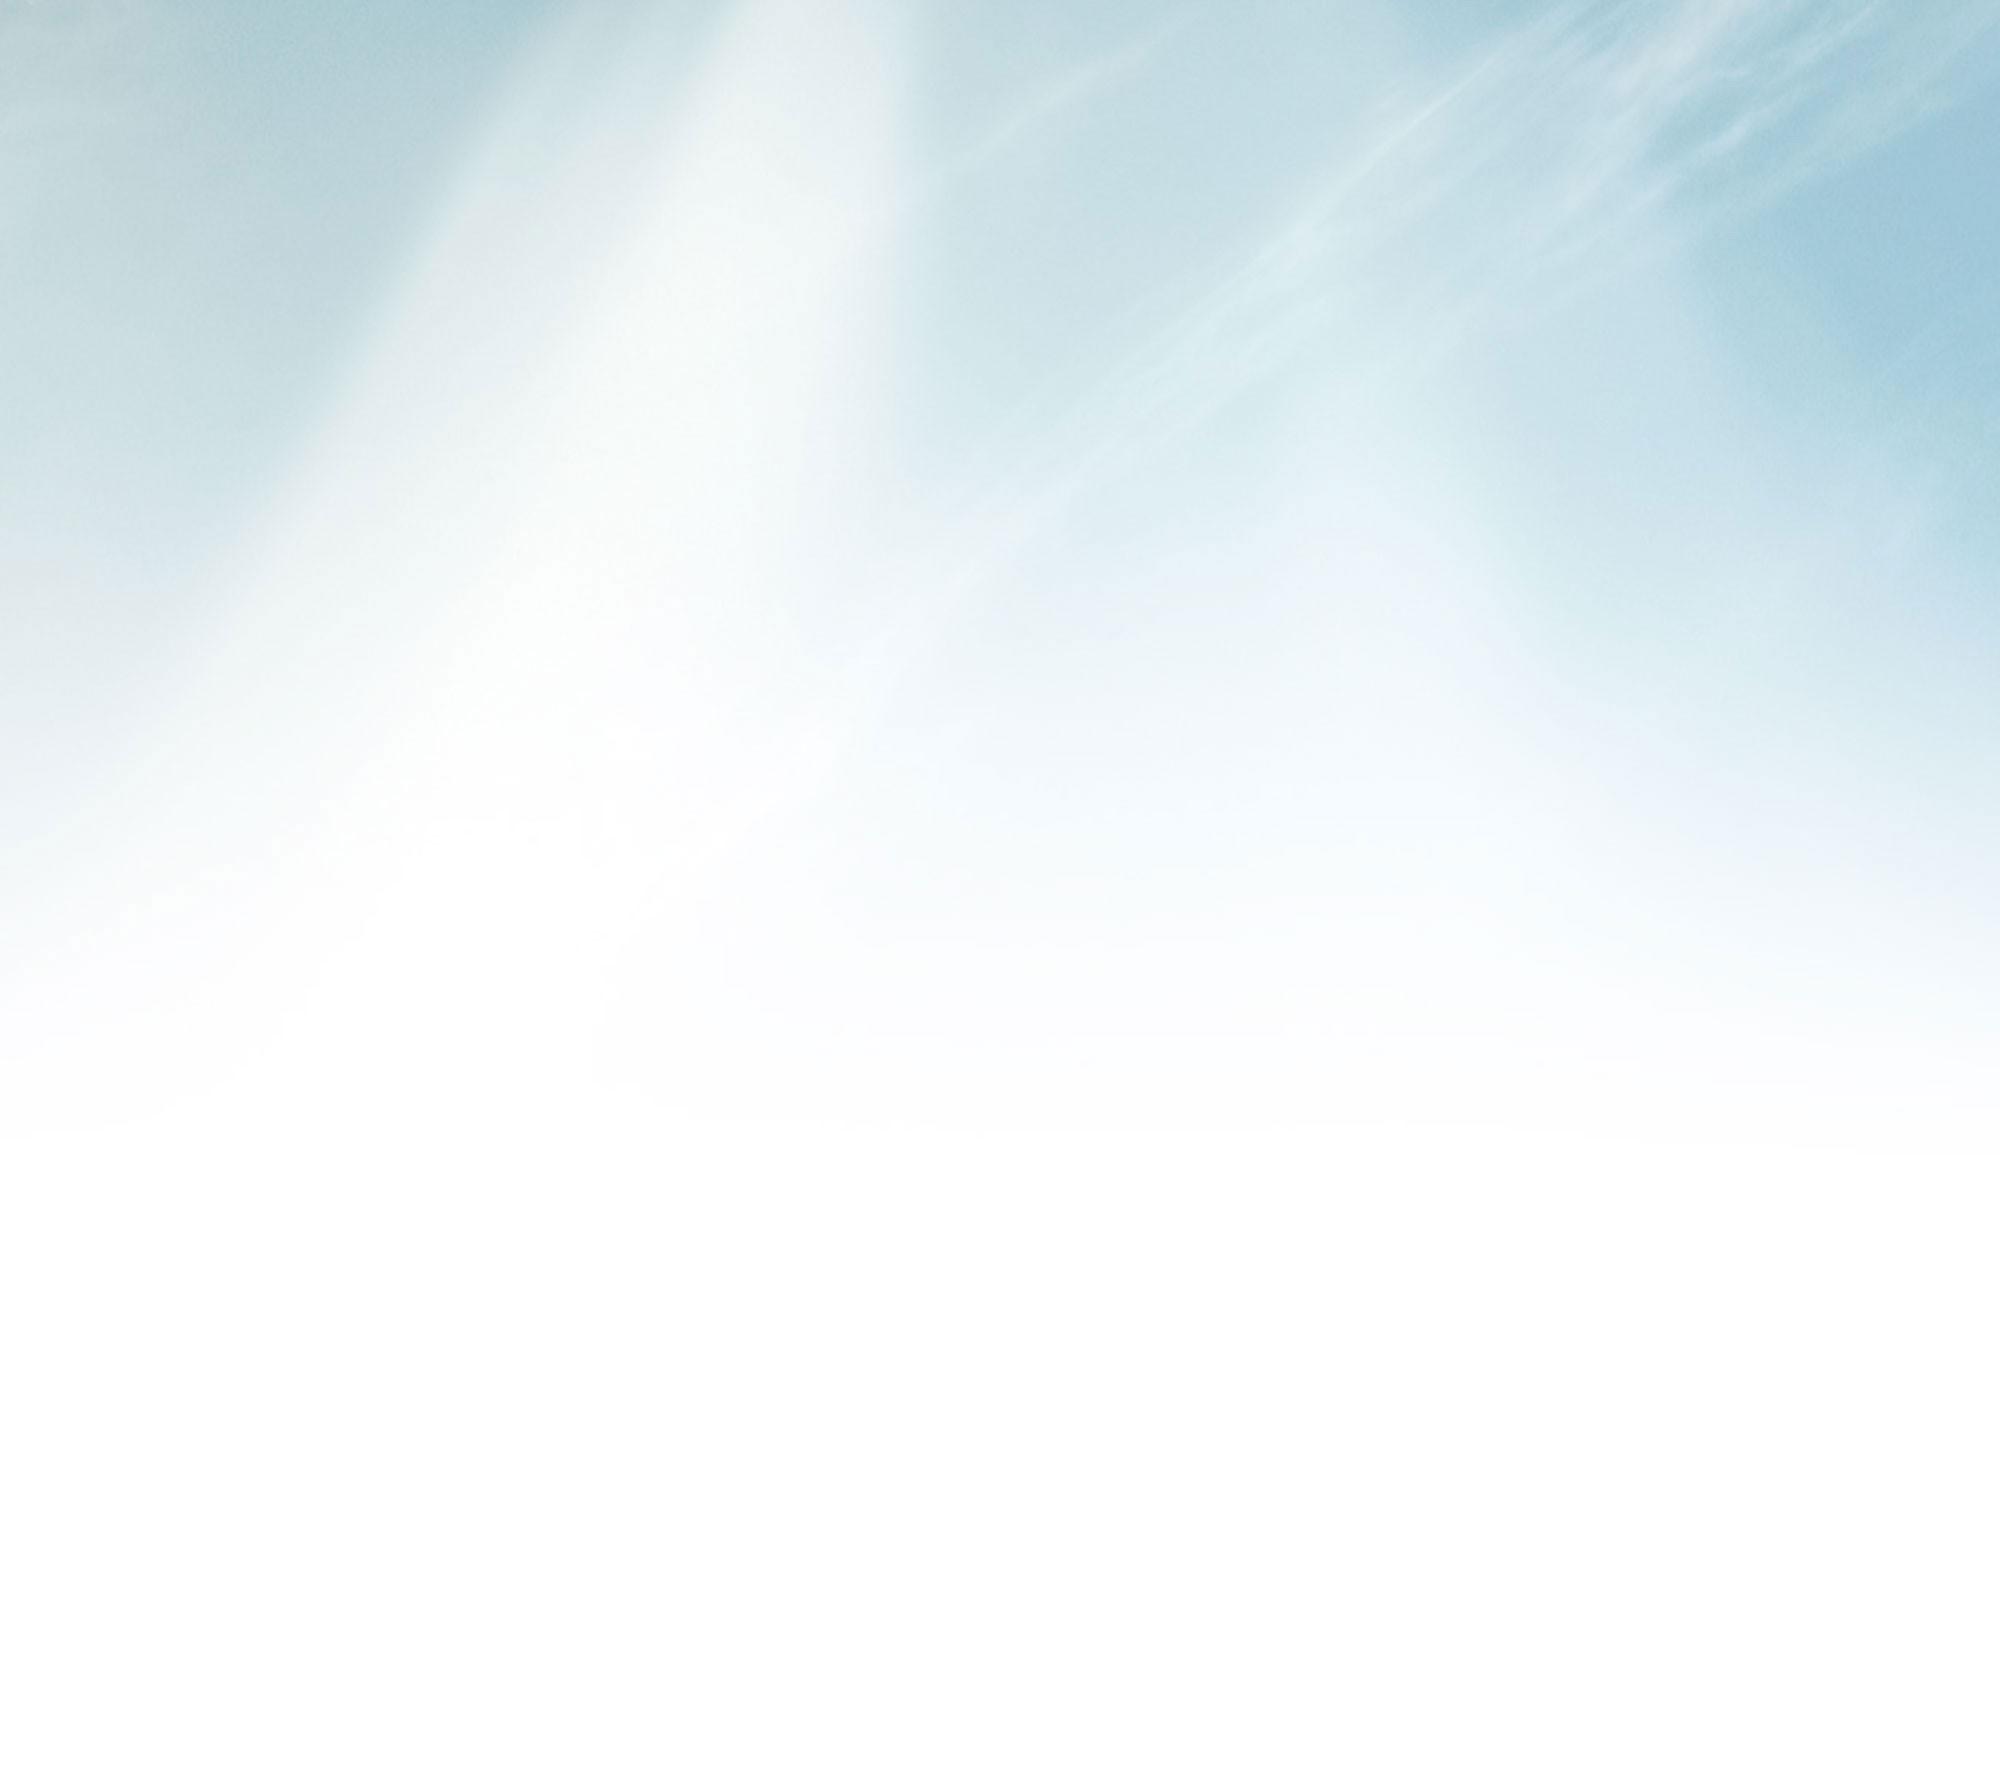 Rayons ciel bleu